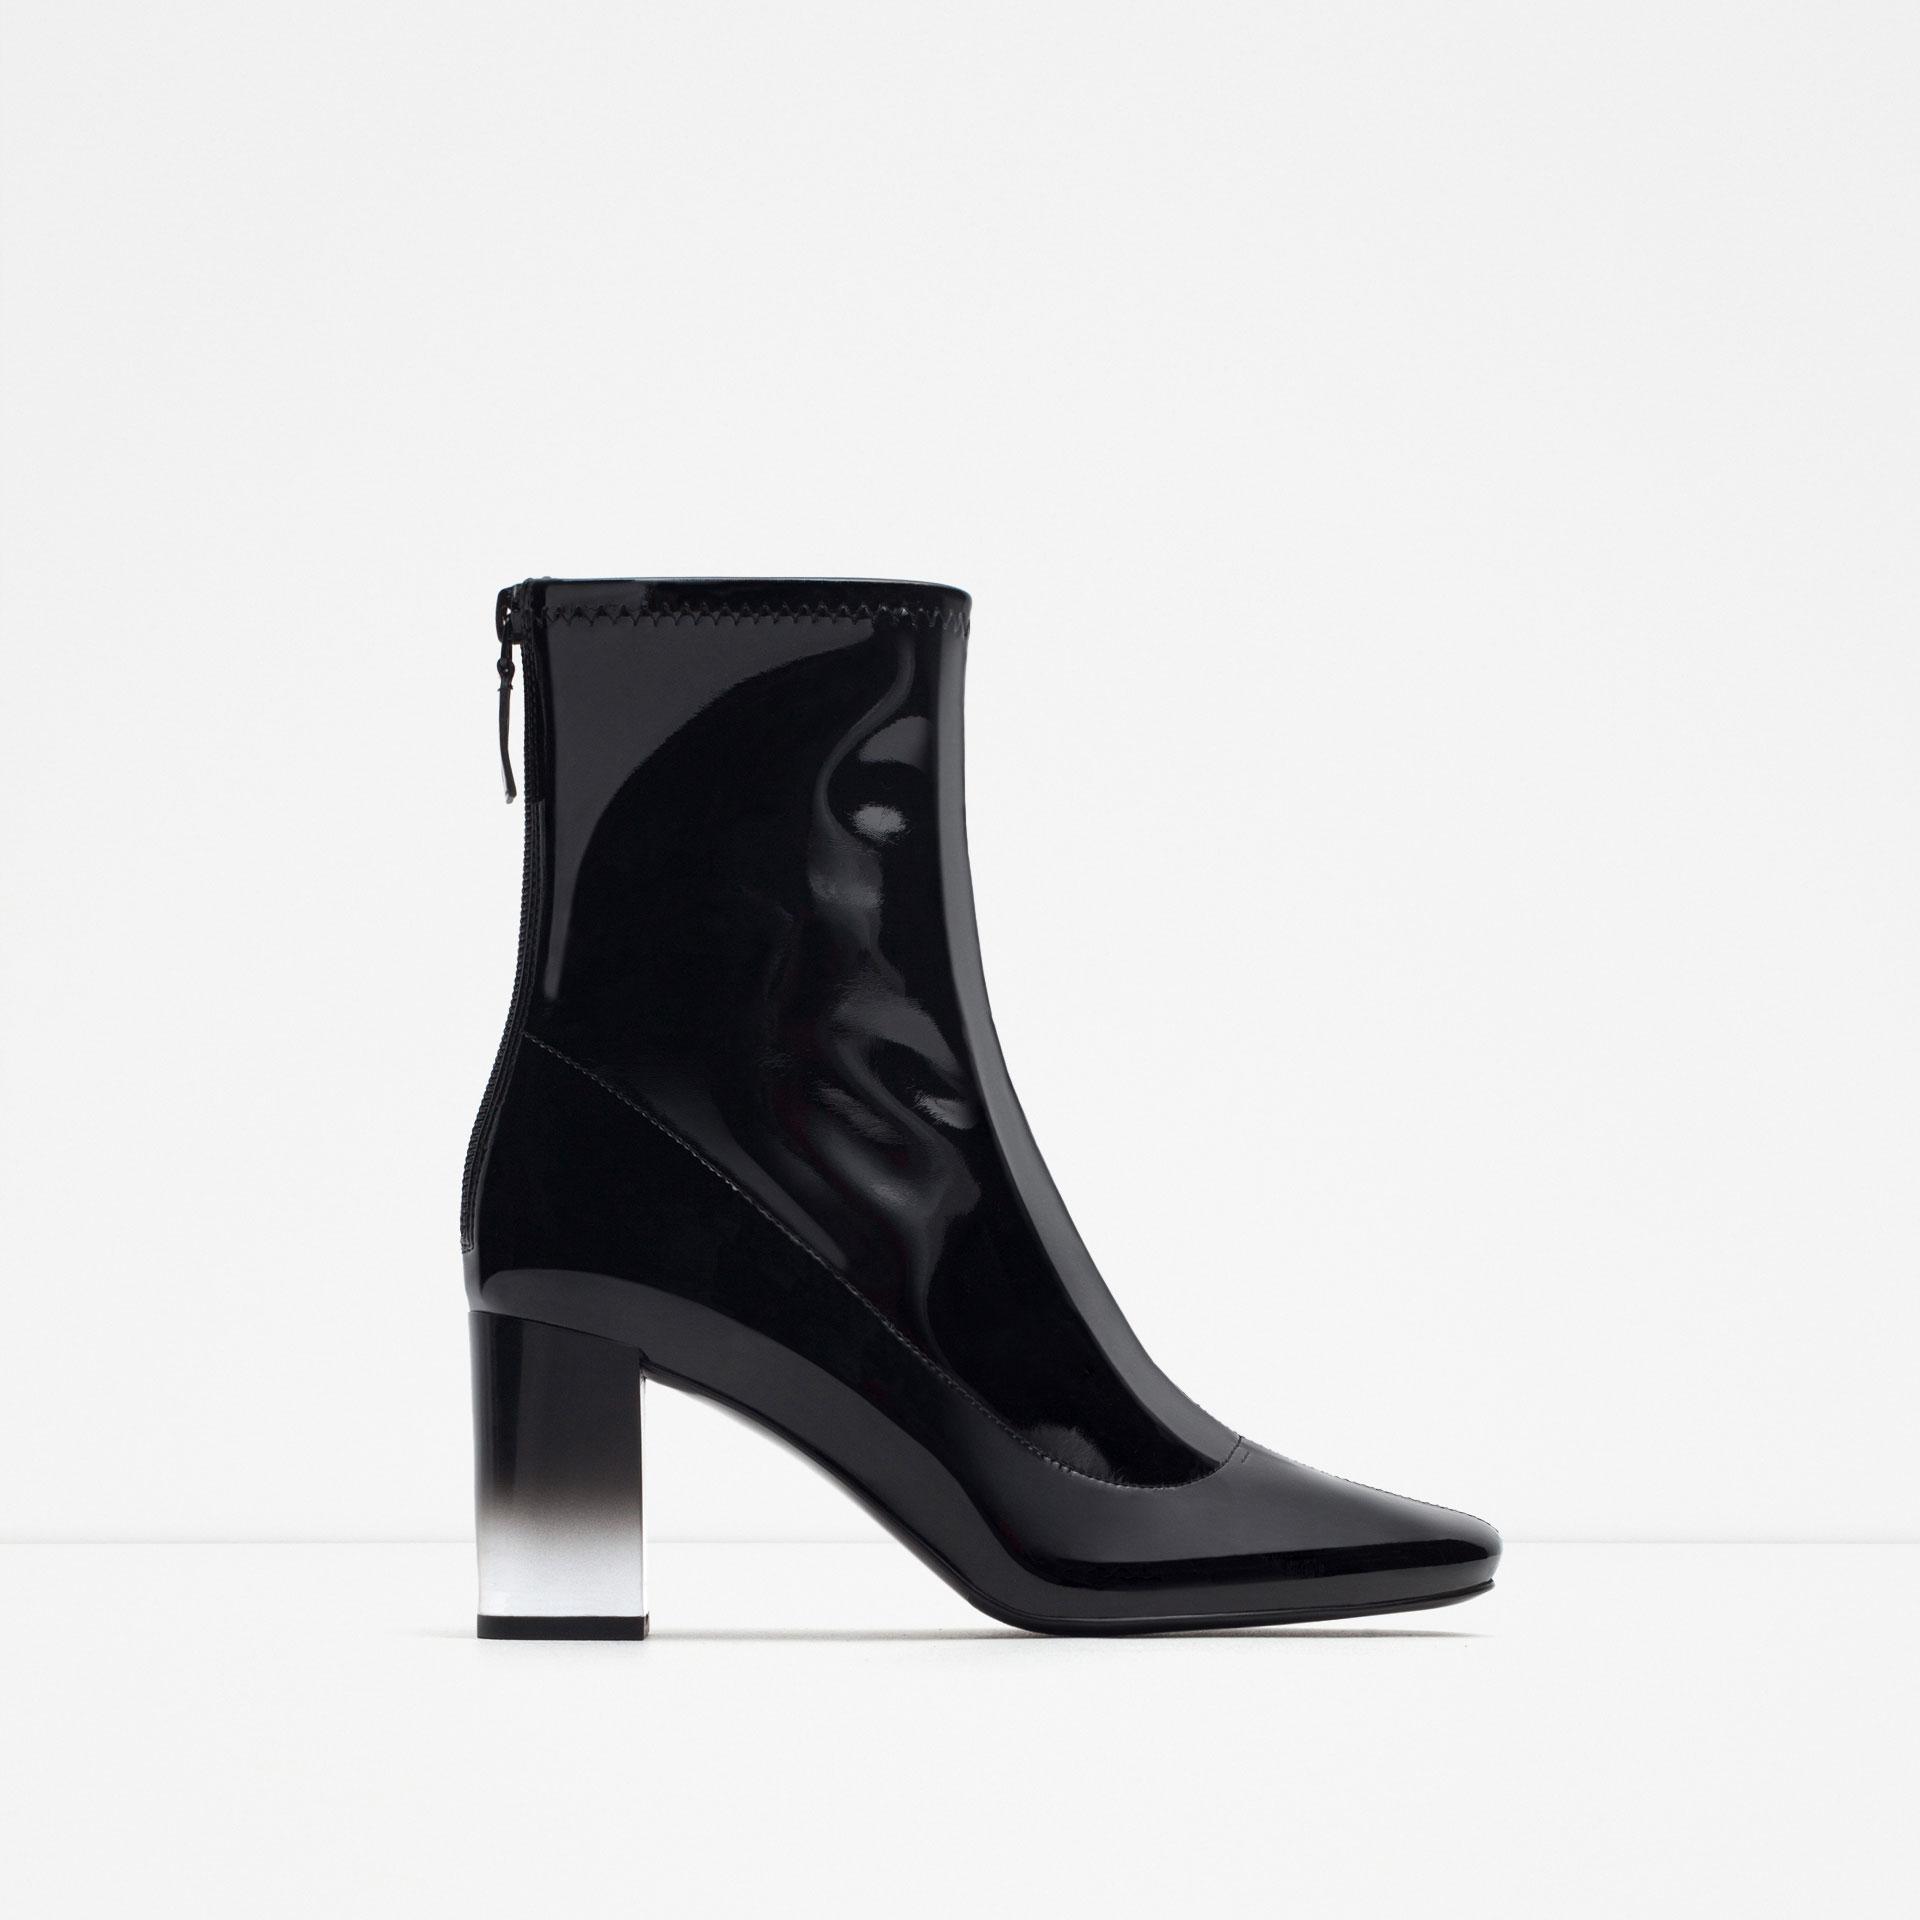 vernies À talon - bottines - chaussures - femme   zara france